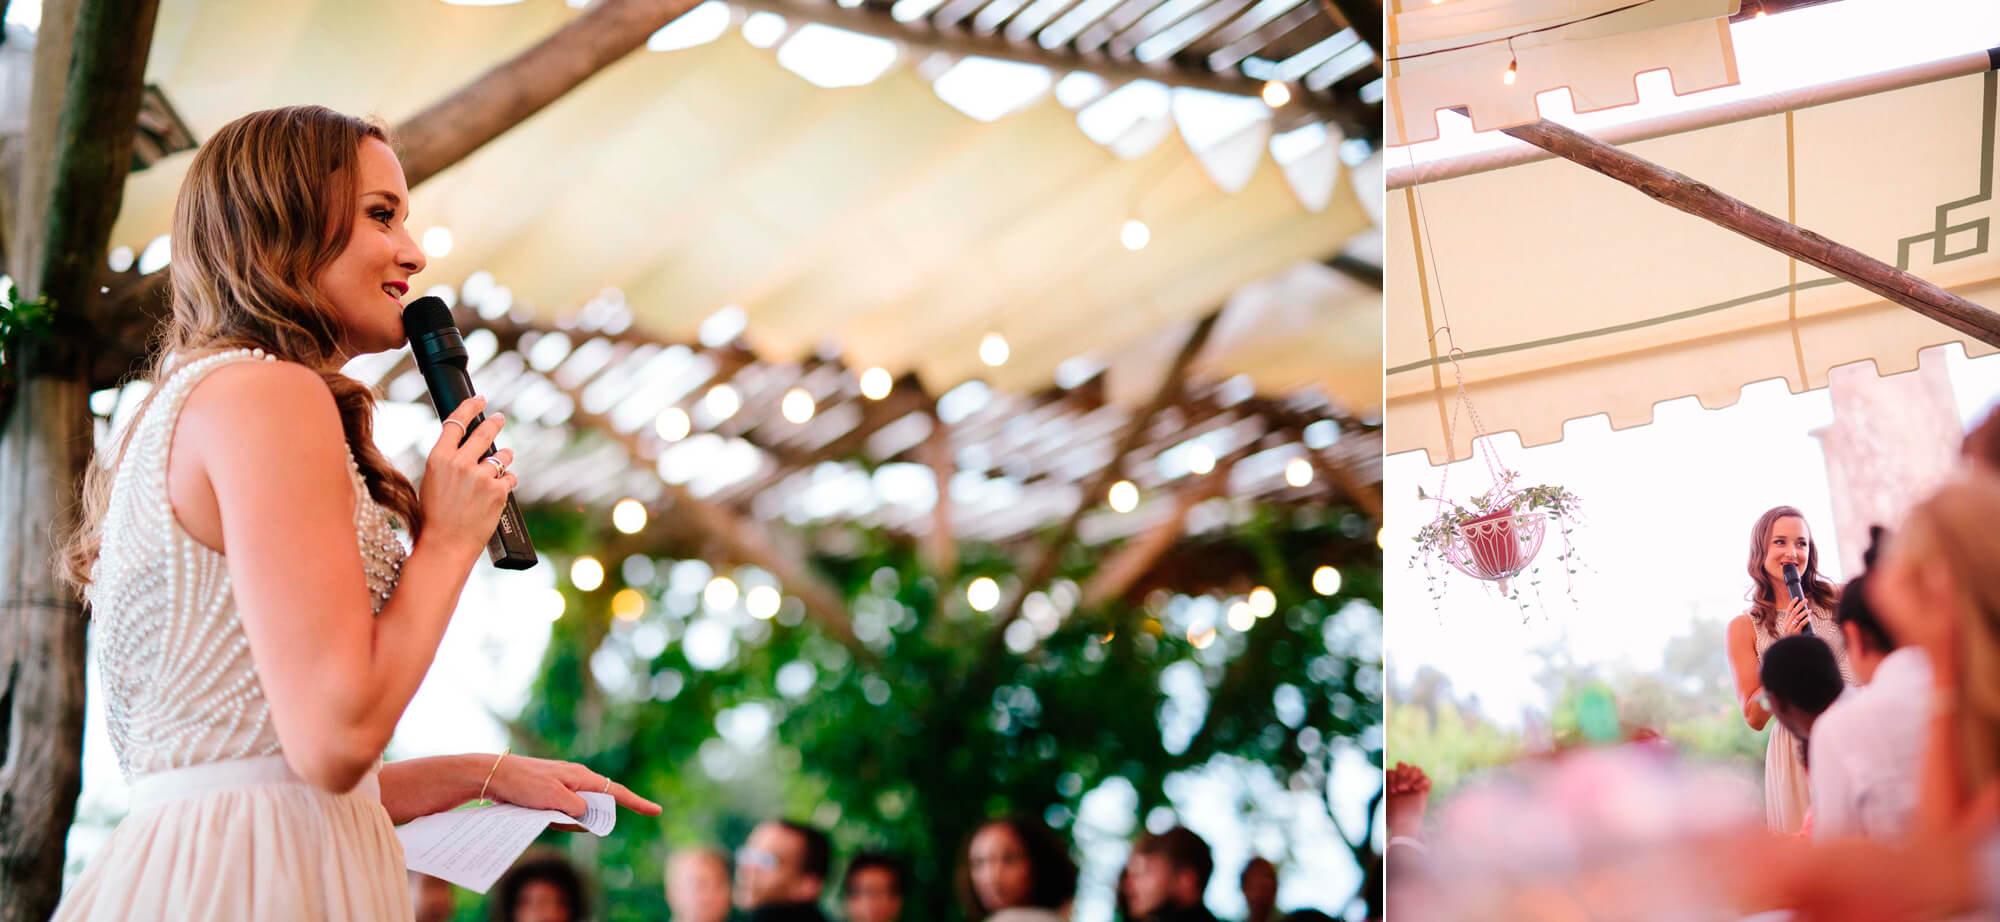 119-sorrento-wedding-photographer.jpg